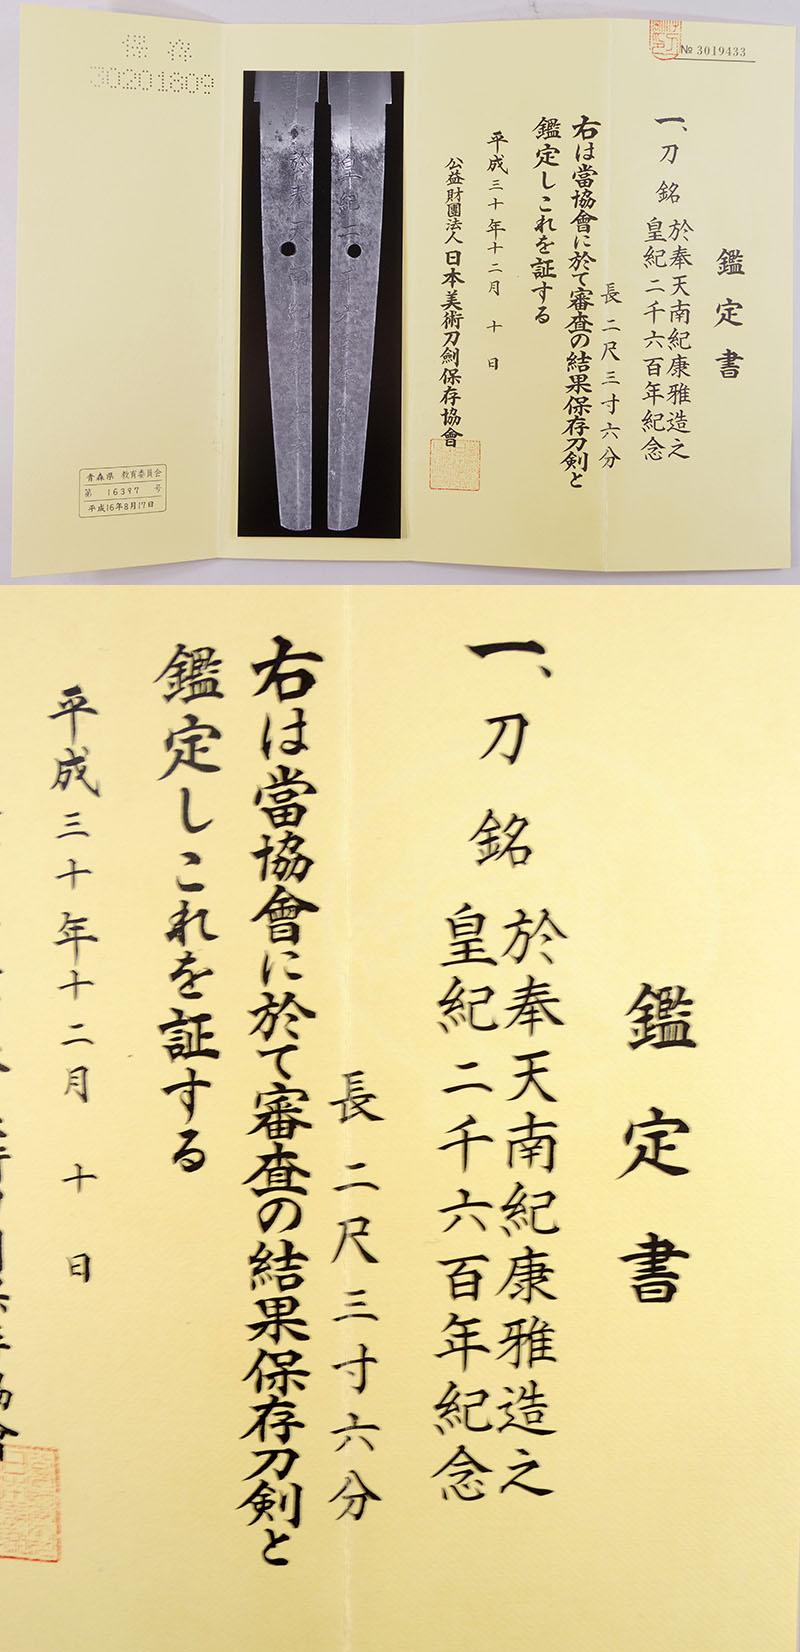 於奉天南紀康雅造之 Picture of Certificate